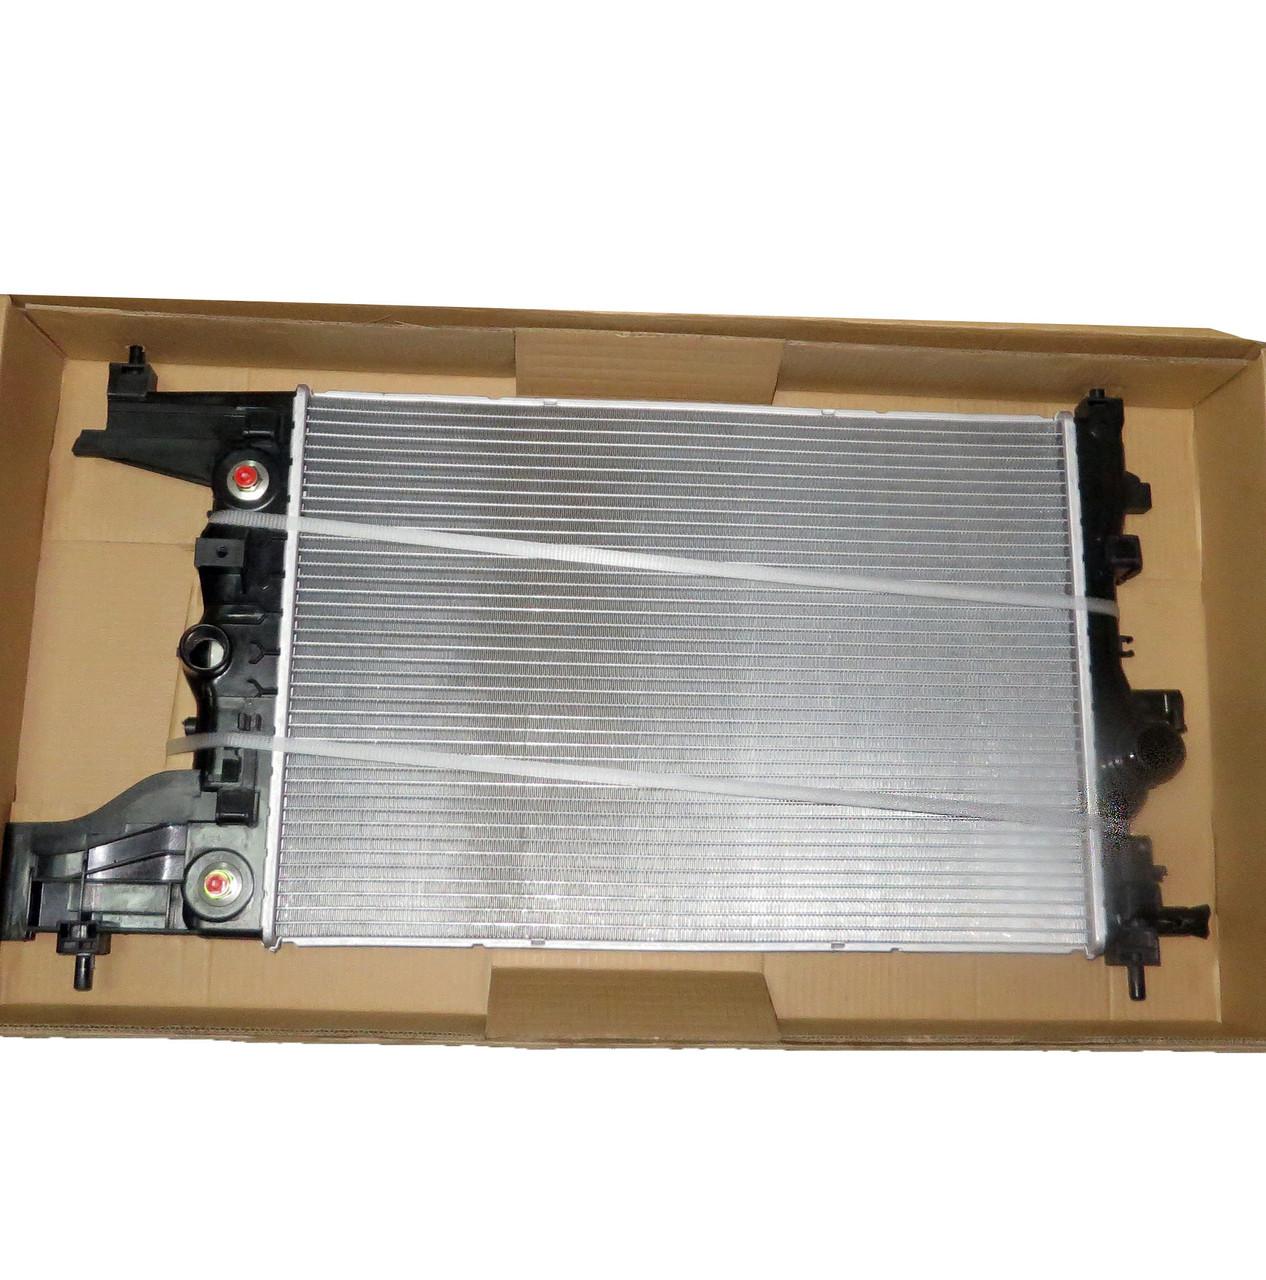 Радиатор основной Круз АКПП, YMLZX, YML-BR-403, 13267652, 13267657-